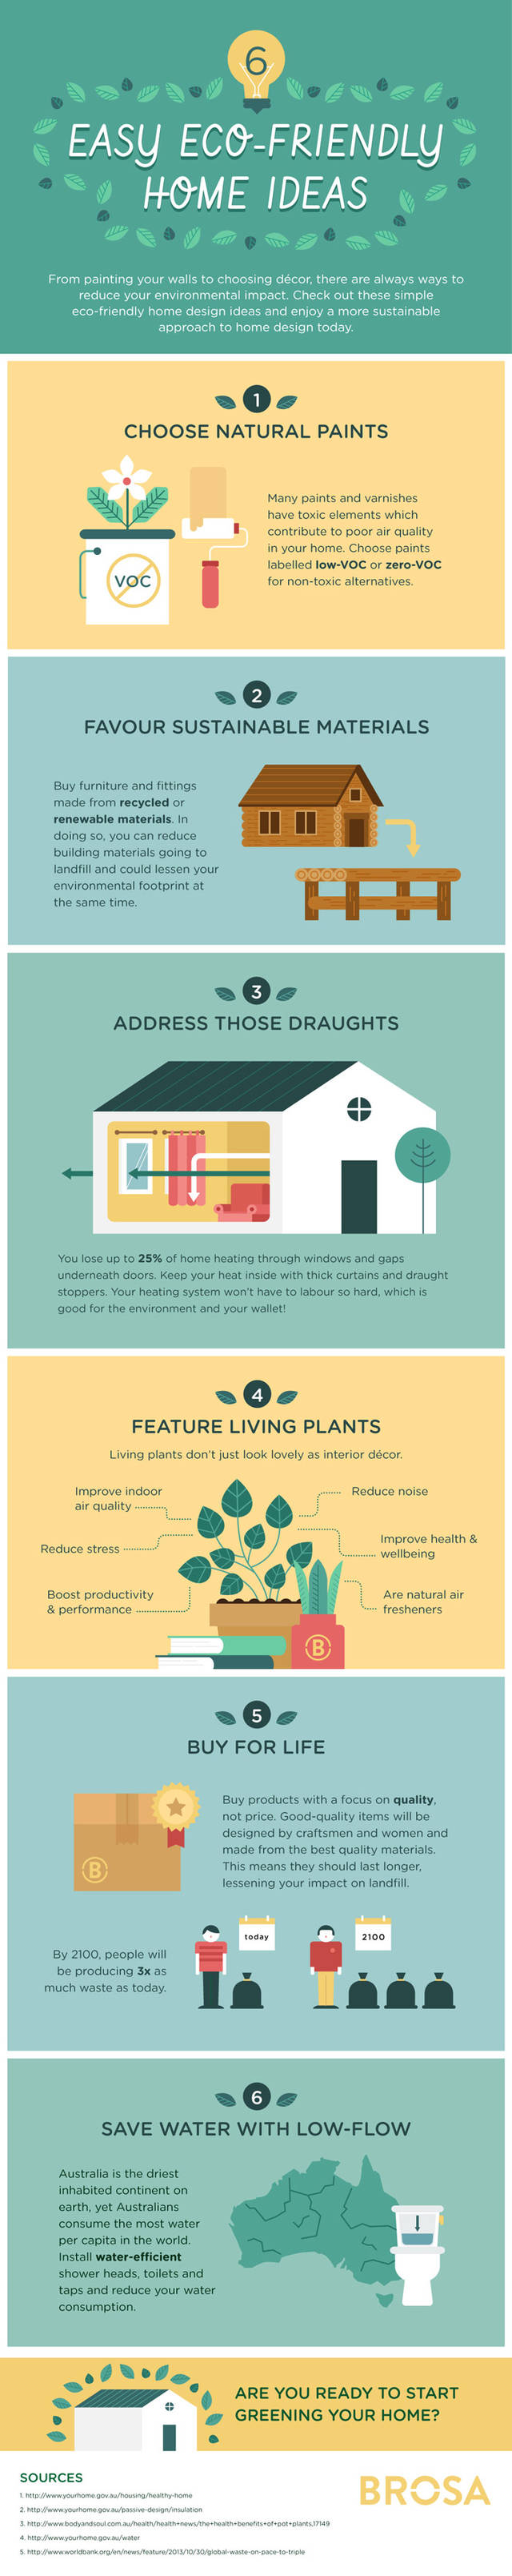 Easy eco friendly ideas infographic